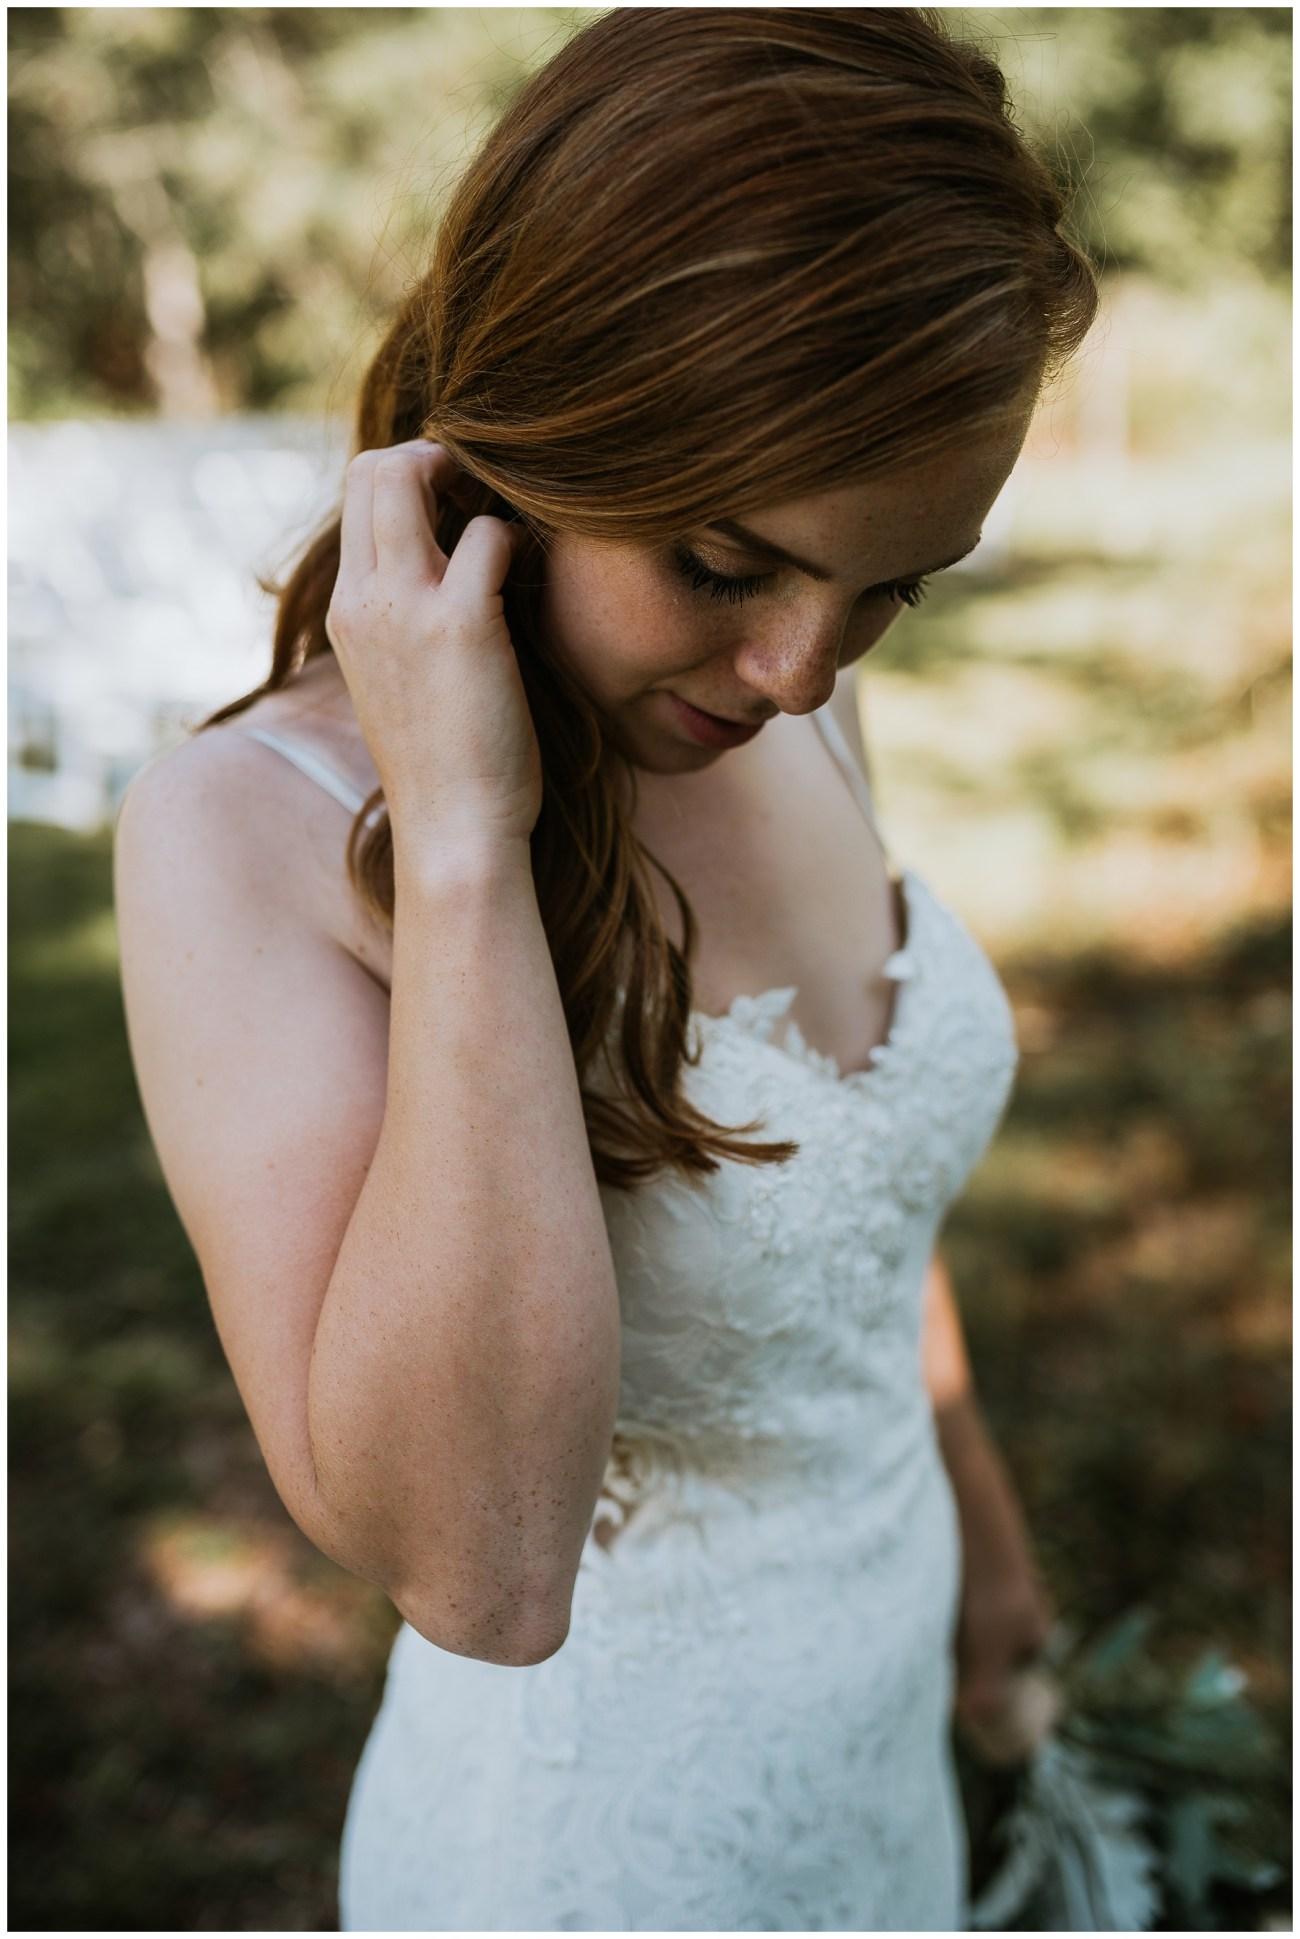 intimate-backyard-wedding-chester-nova-scotia_29.jpg